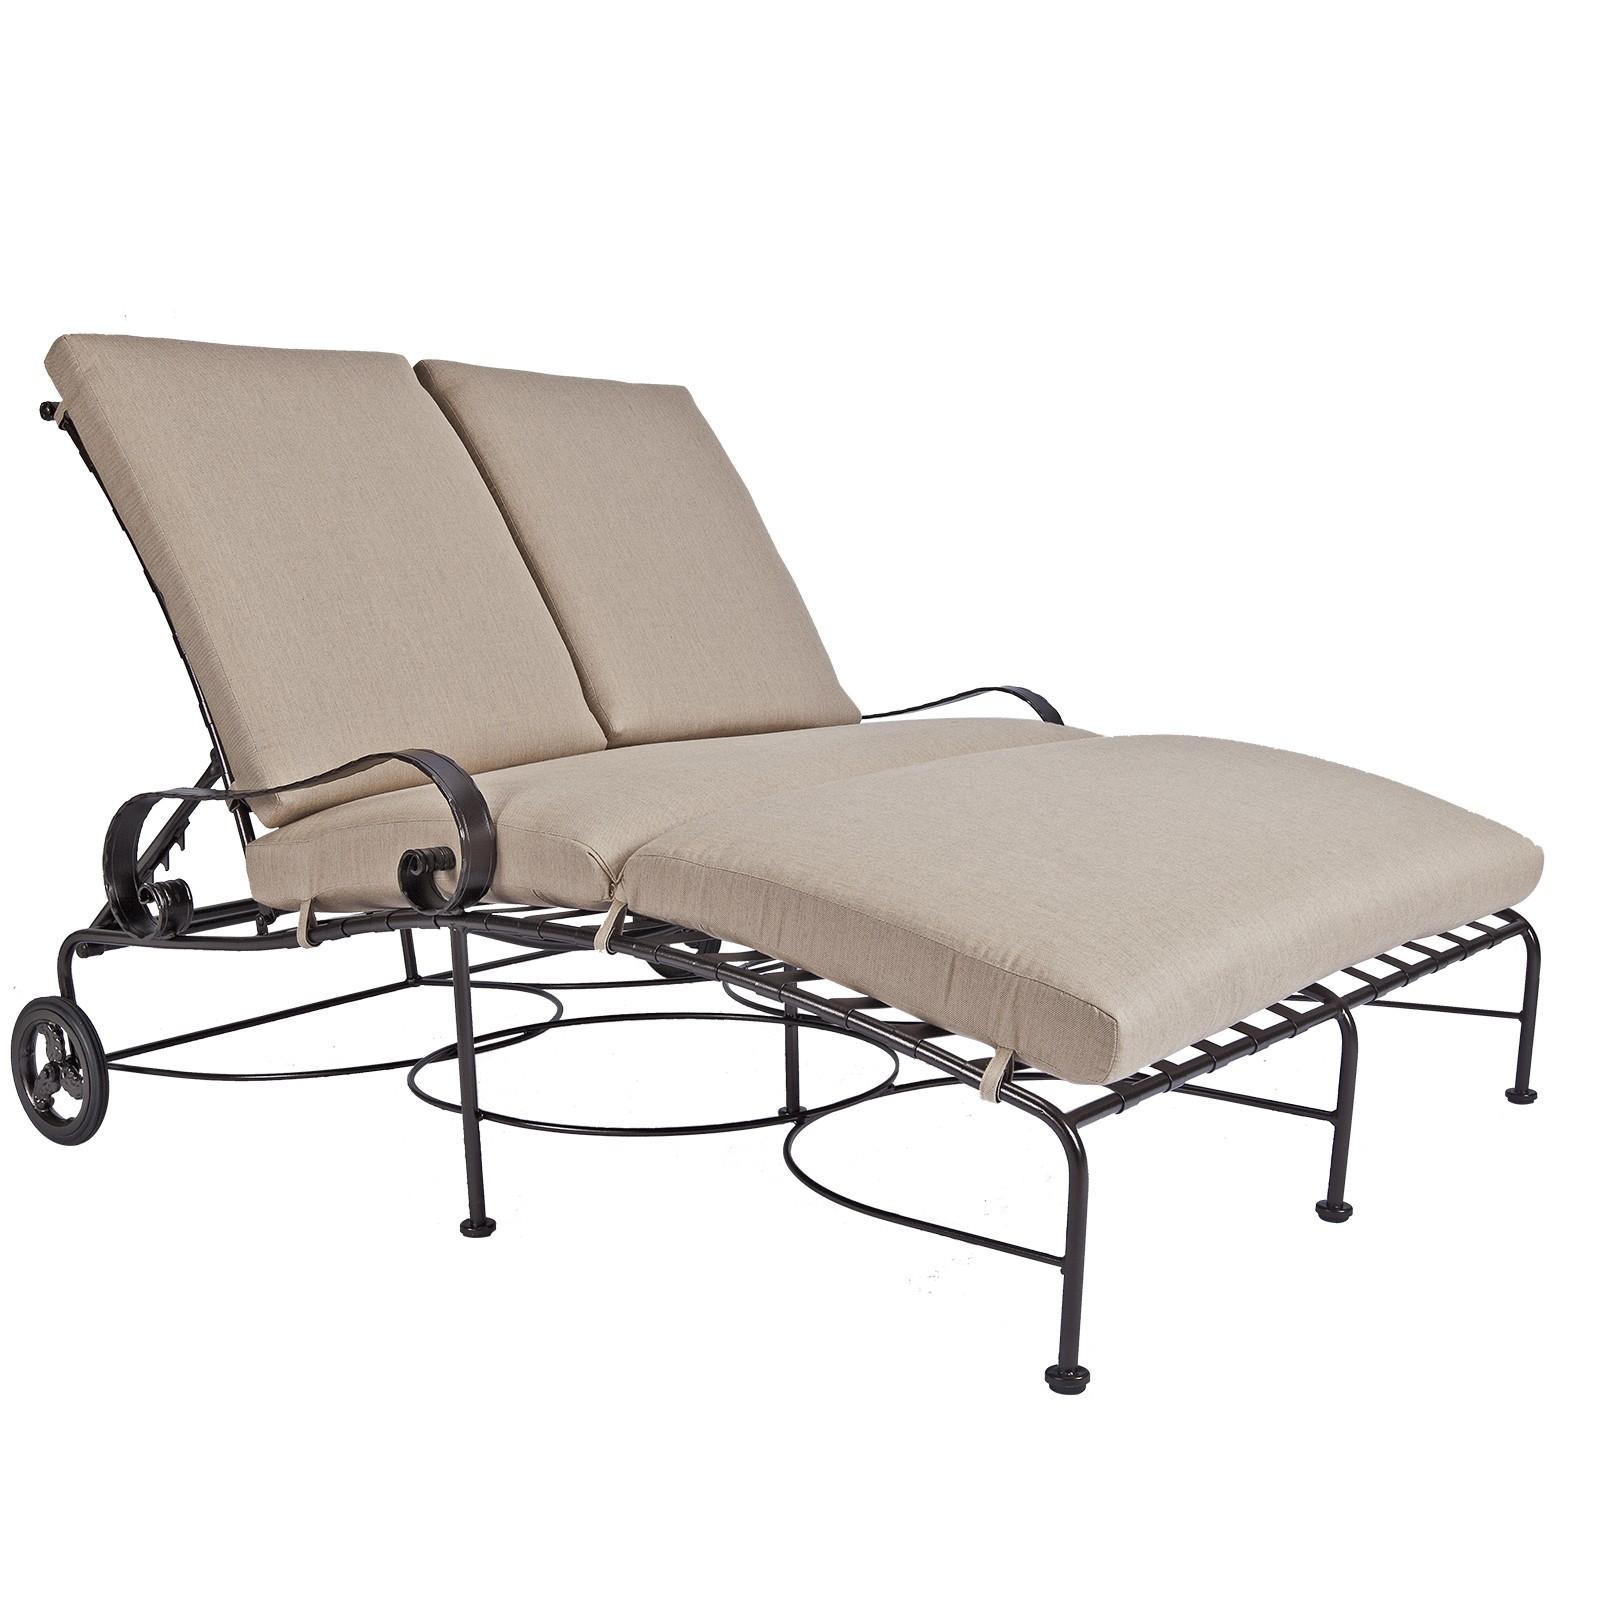 Classico W Adjustable Double Chaise Hauser S Patio